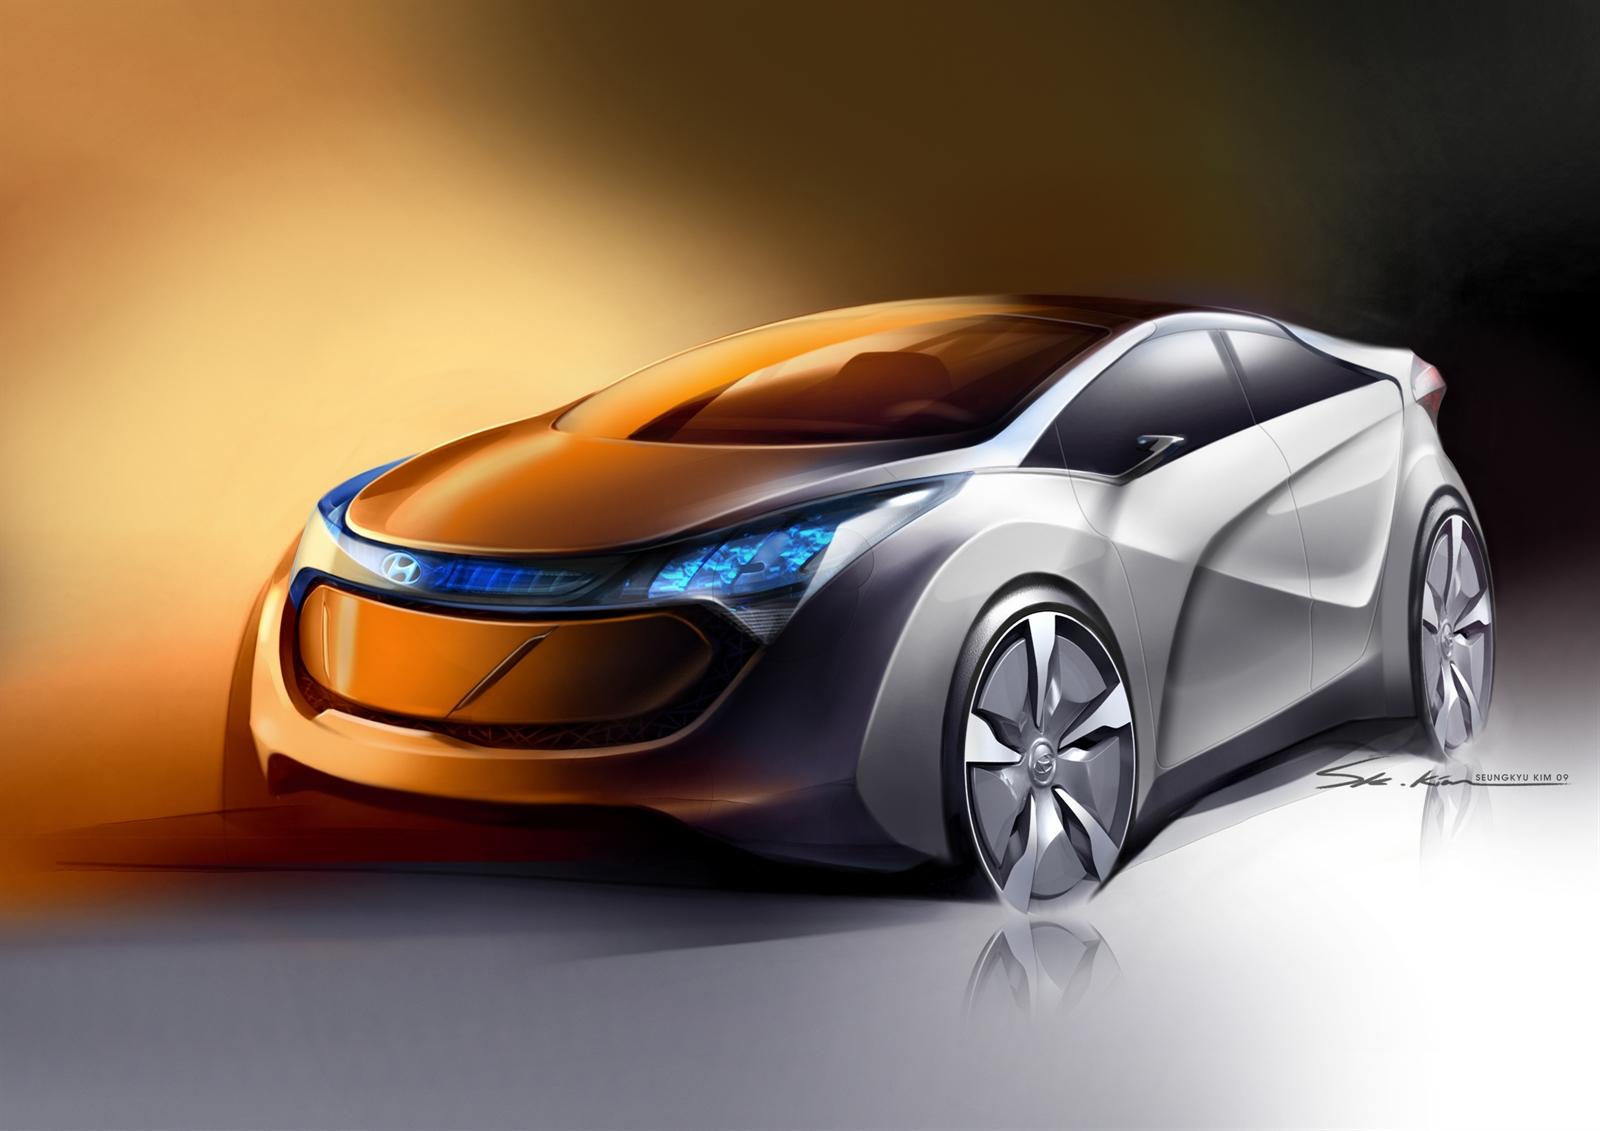 Hyundai\'s Future Cars Line-Up Until 2018 - The Korean Car Blog